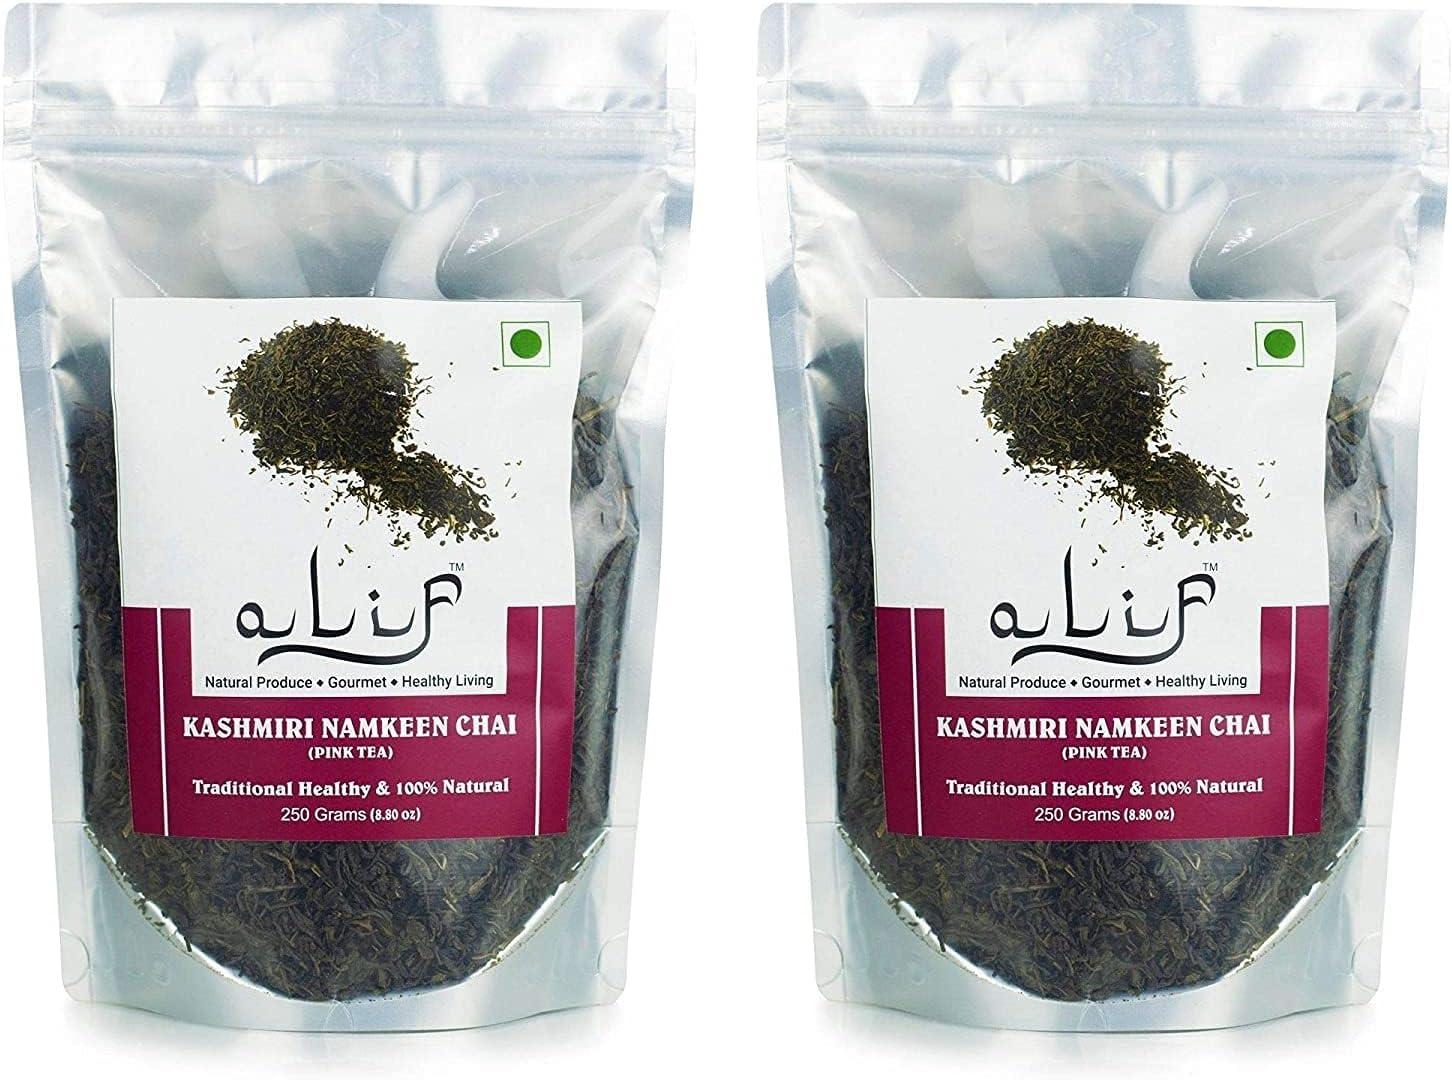 Valocity Max 70% OFF Alif Premium Kashmiri Spring new work Namkeen Tea 500g Noon 250gx2 Ch